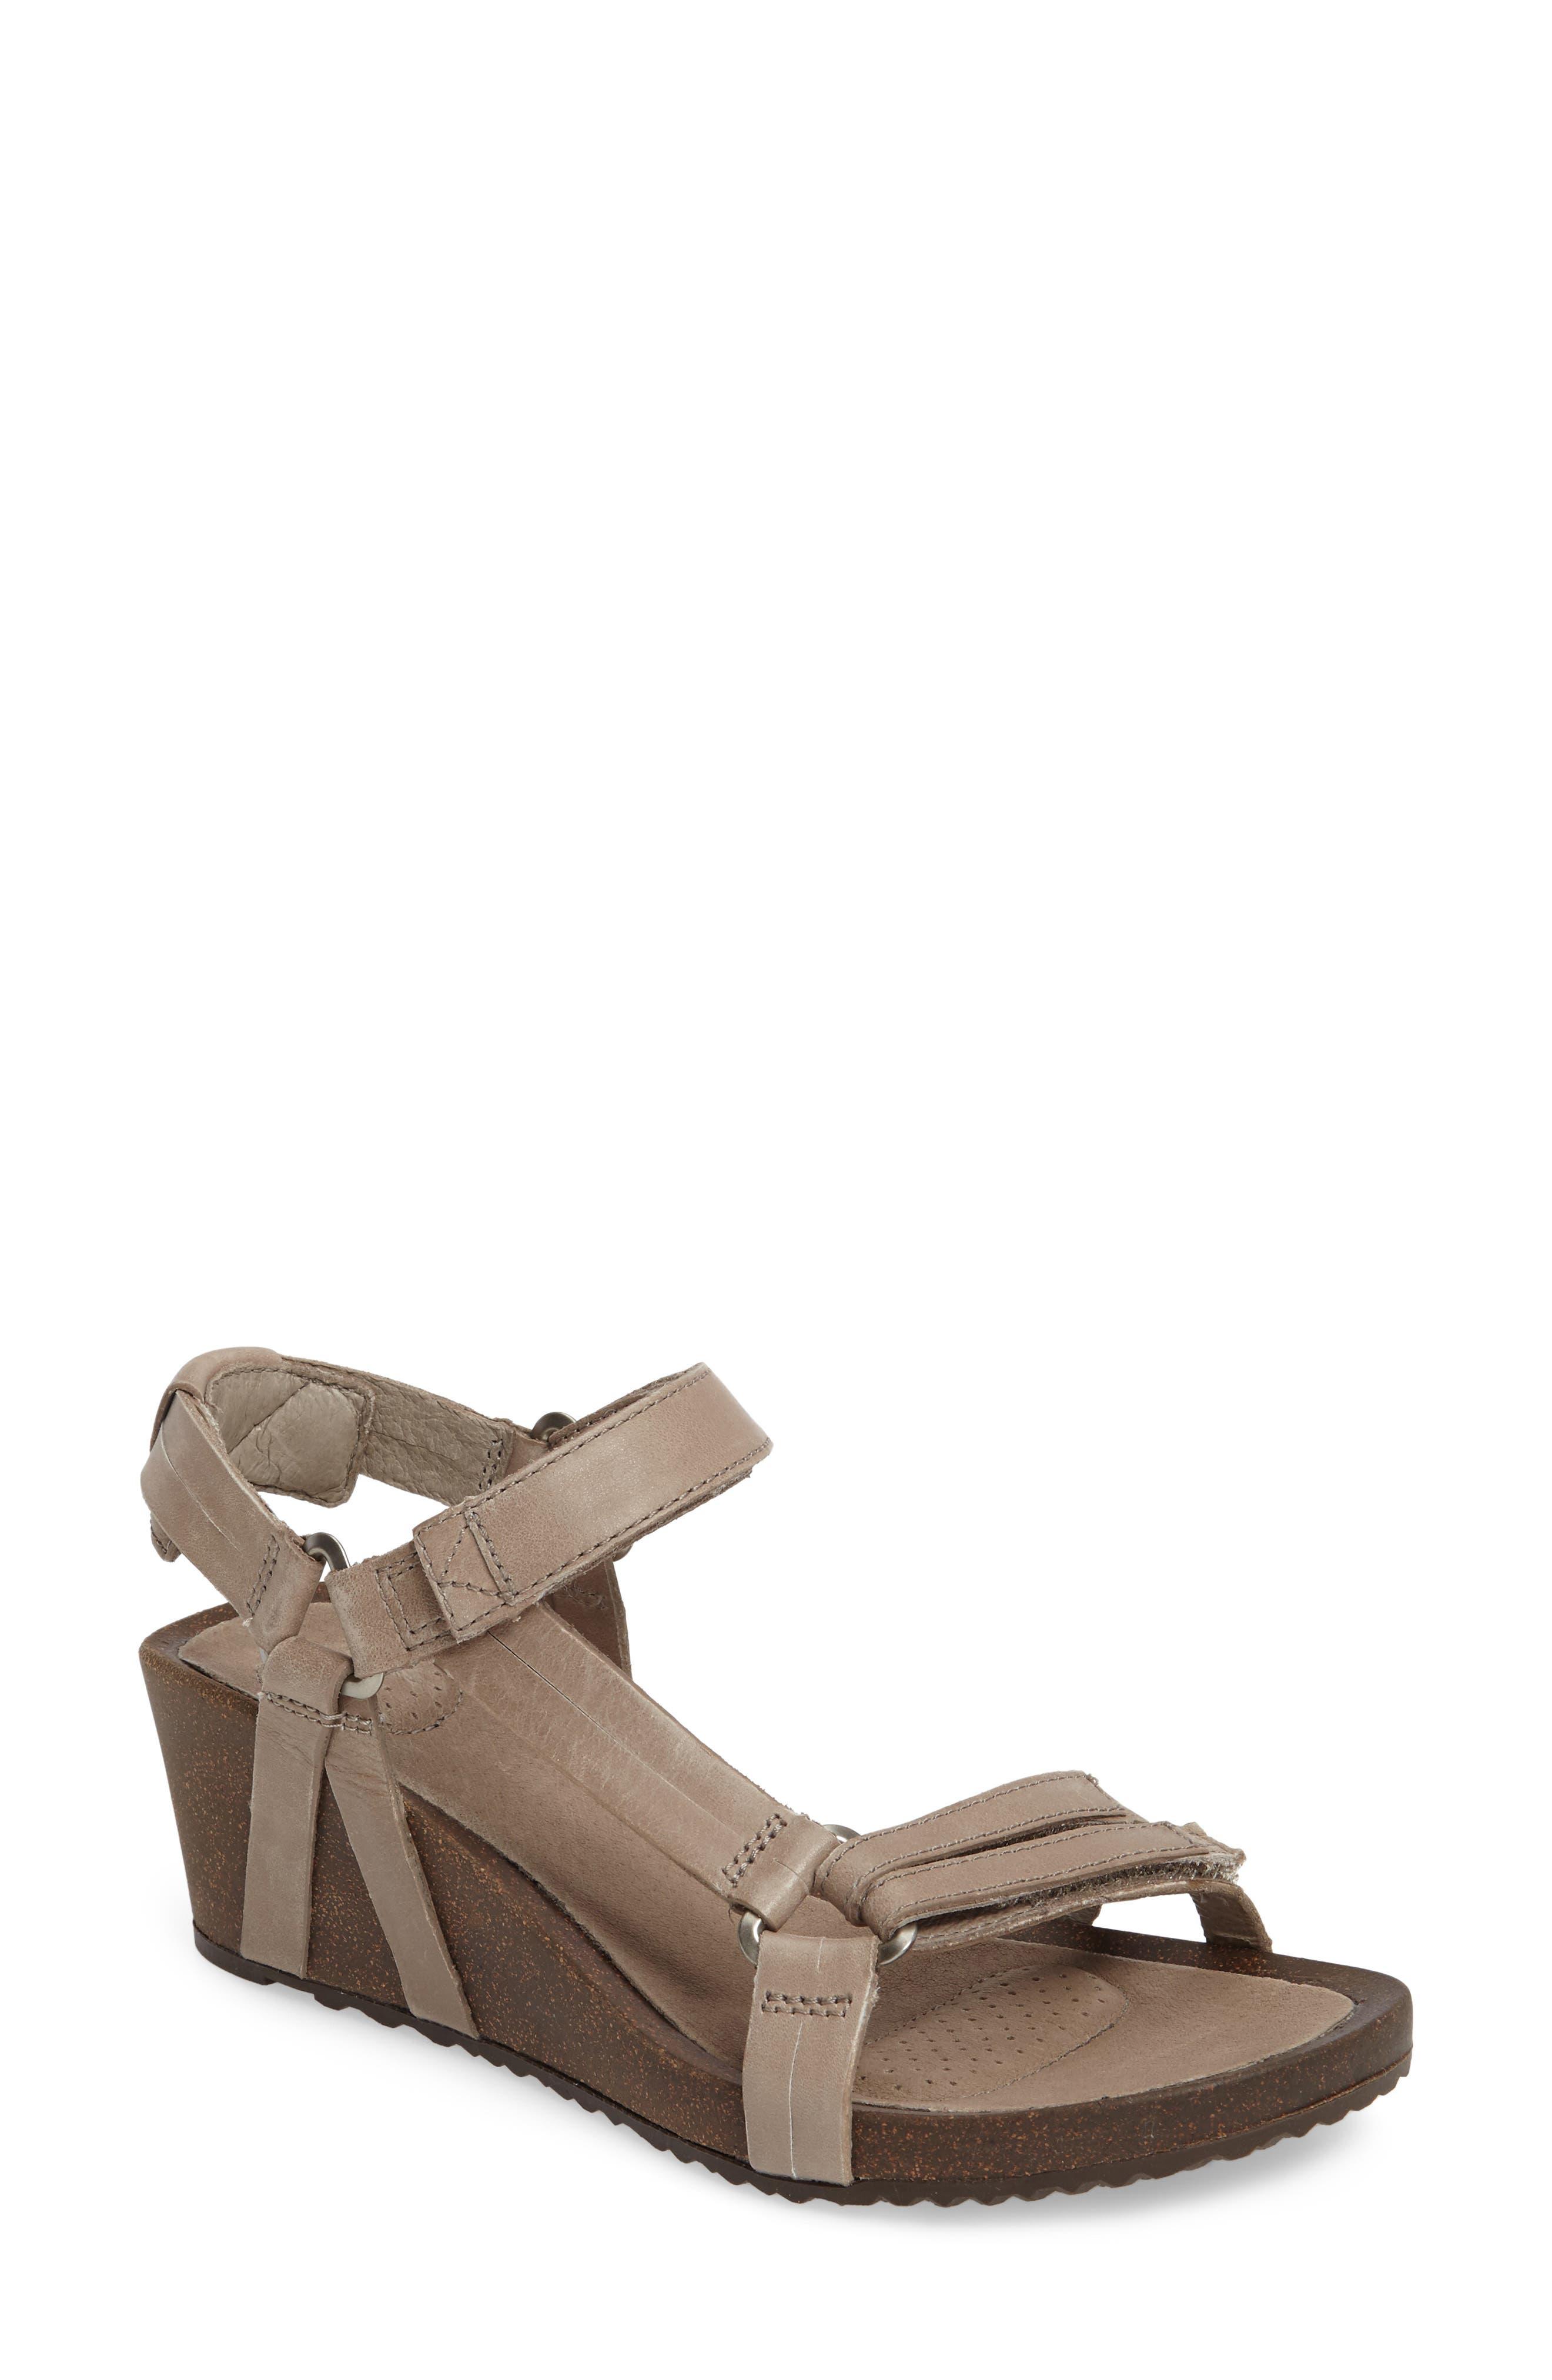 Ysidro Wedge Sandal,                             Main thumbnail 1, color,                             Taupe Leather